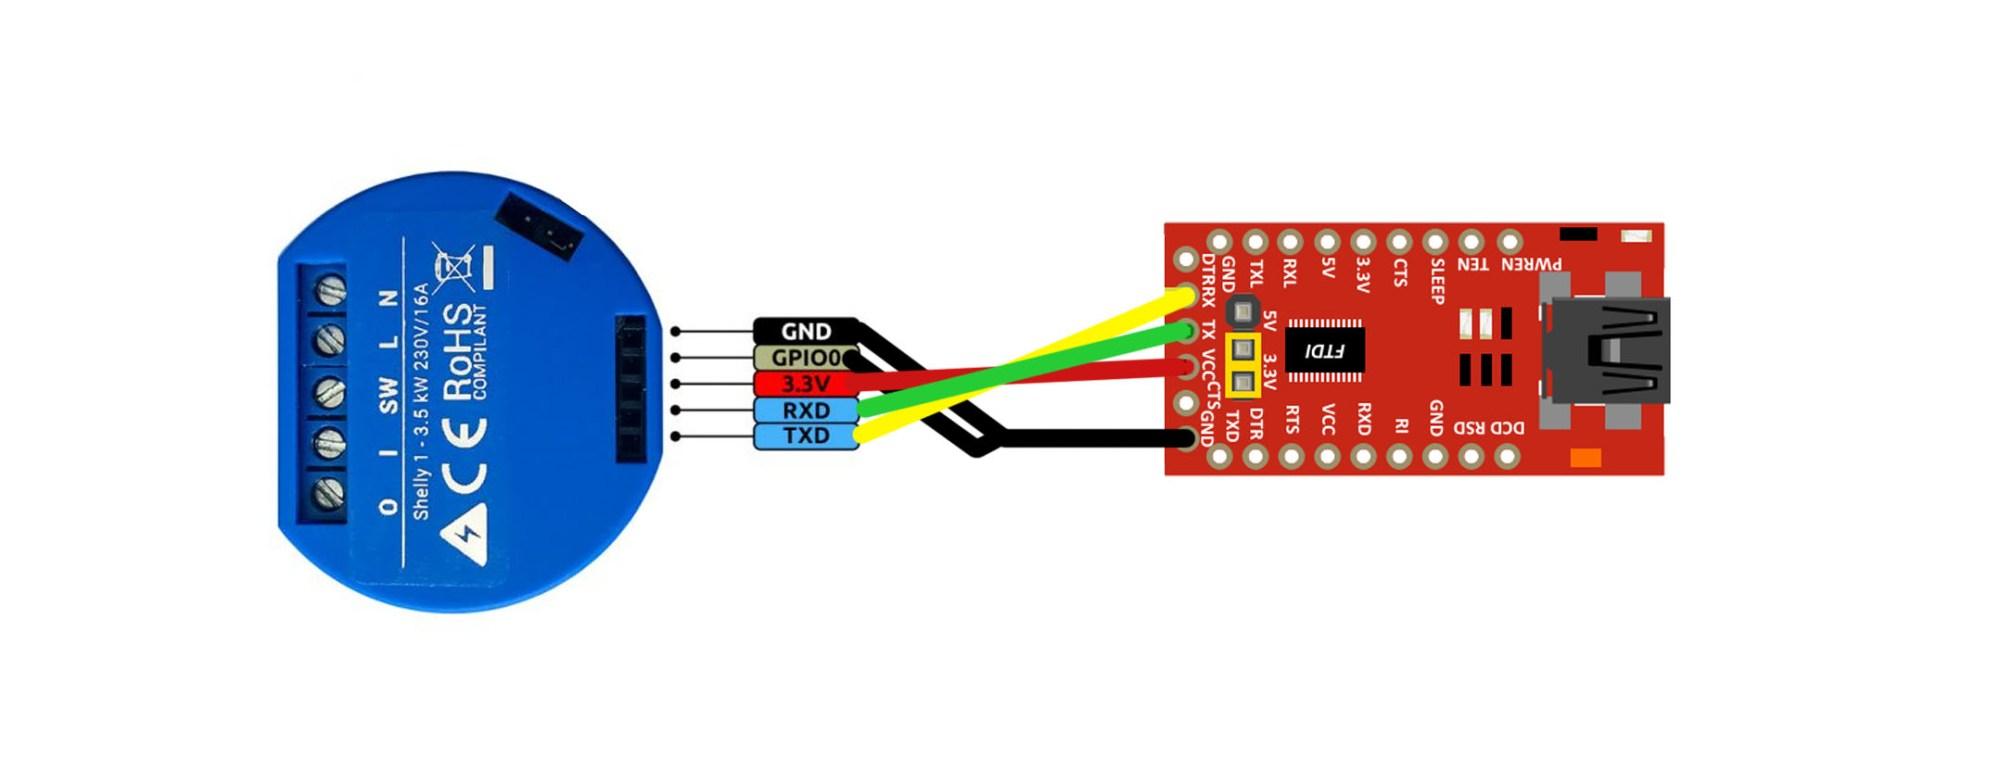 hight resolution of smart flash wiring diagram diagram data schema smart flash wiring diagram